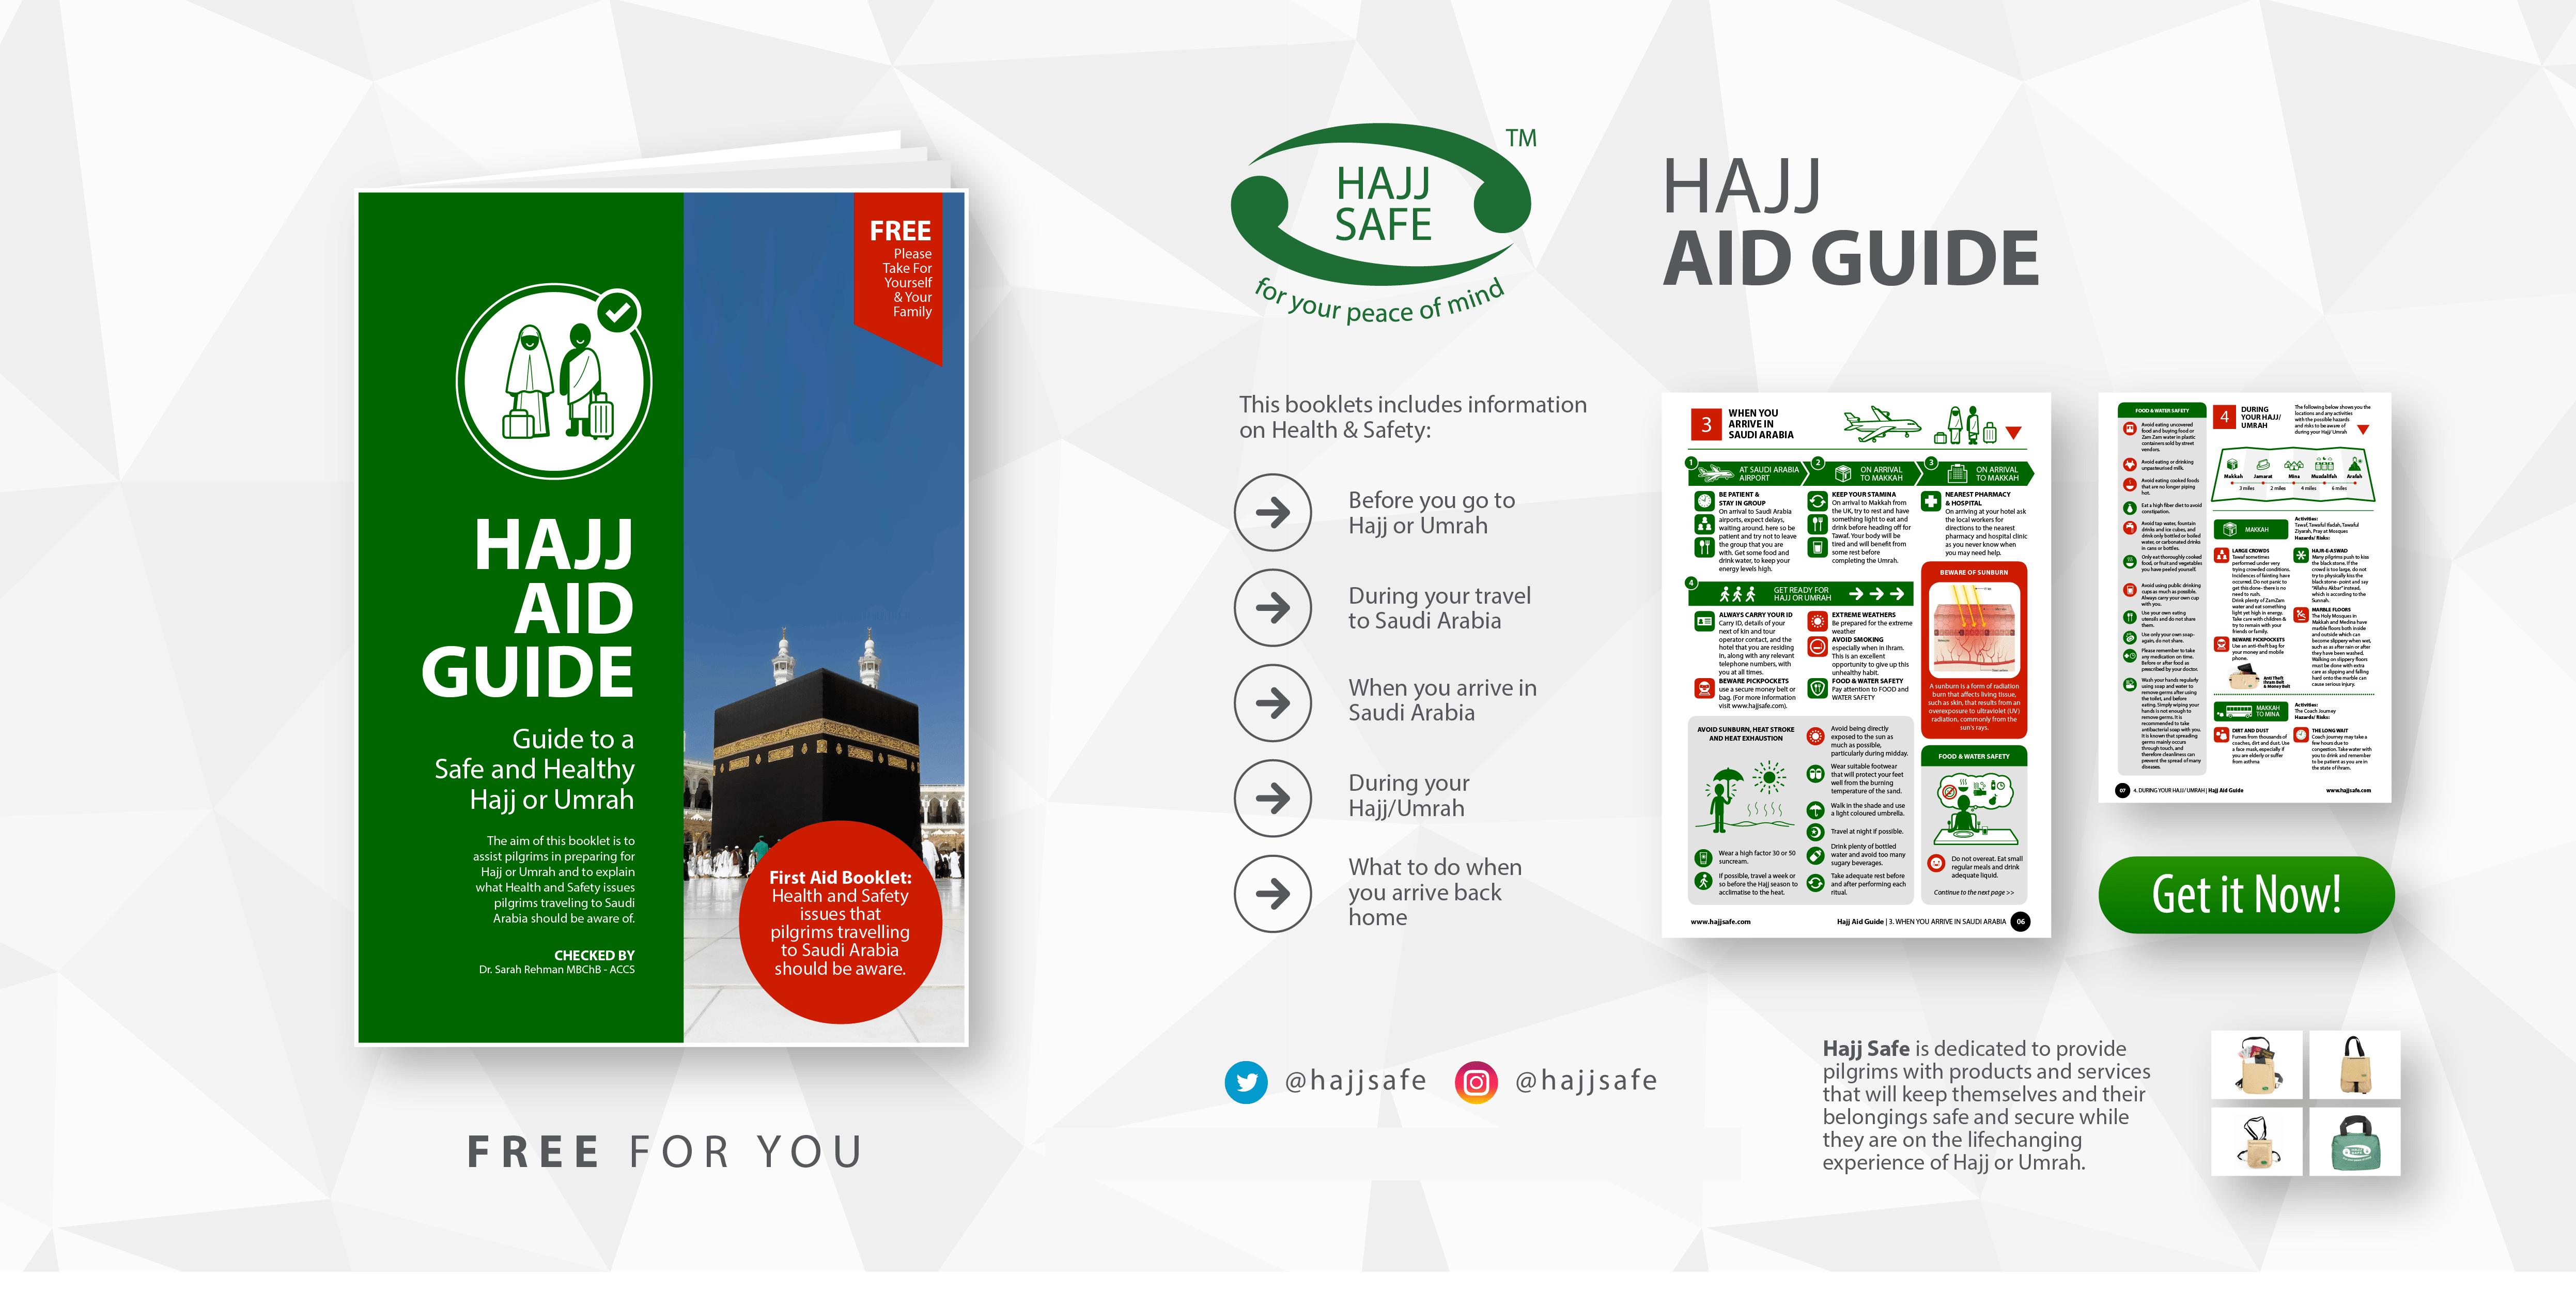 Hajj Safe Homepage / Hajj / Umrah / Anti-Theft / Ihram / Health